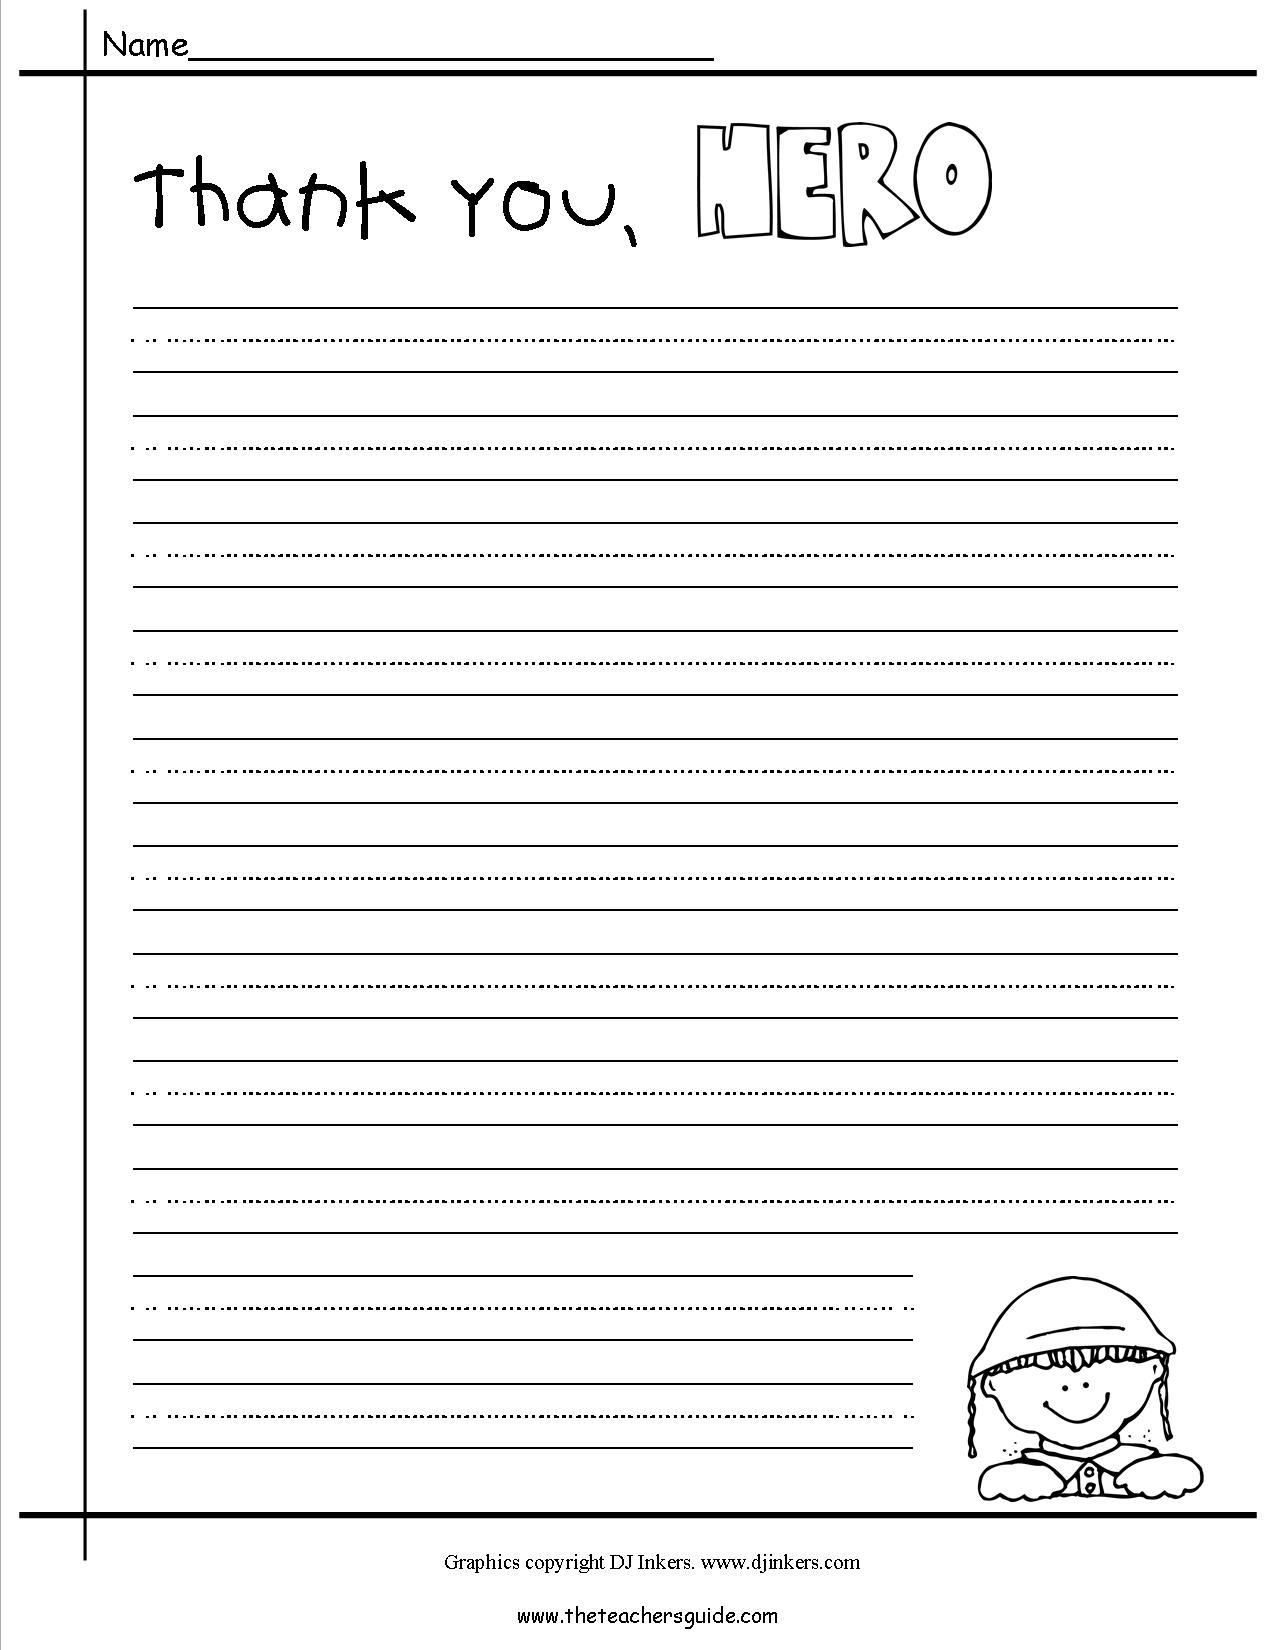 Veterans Day Thank You Letter Template - Veteran Thank You Letter Image Collections Letter format formal Sample